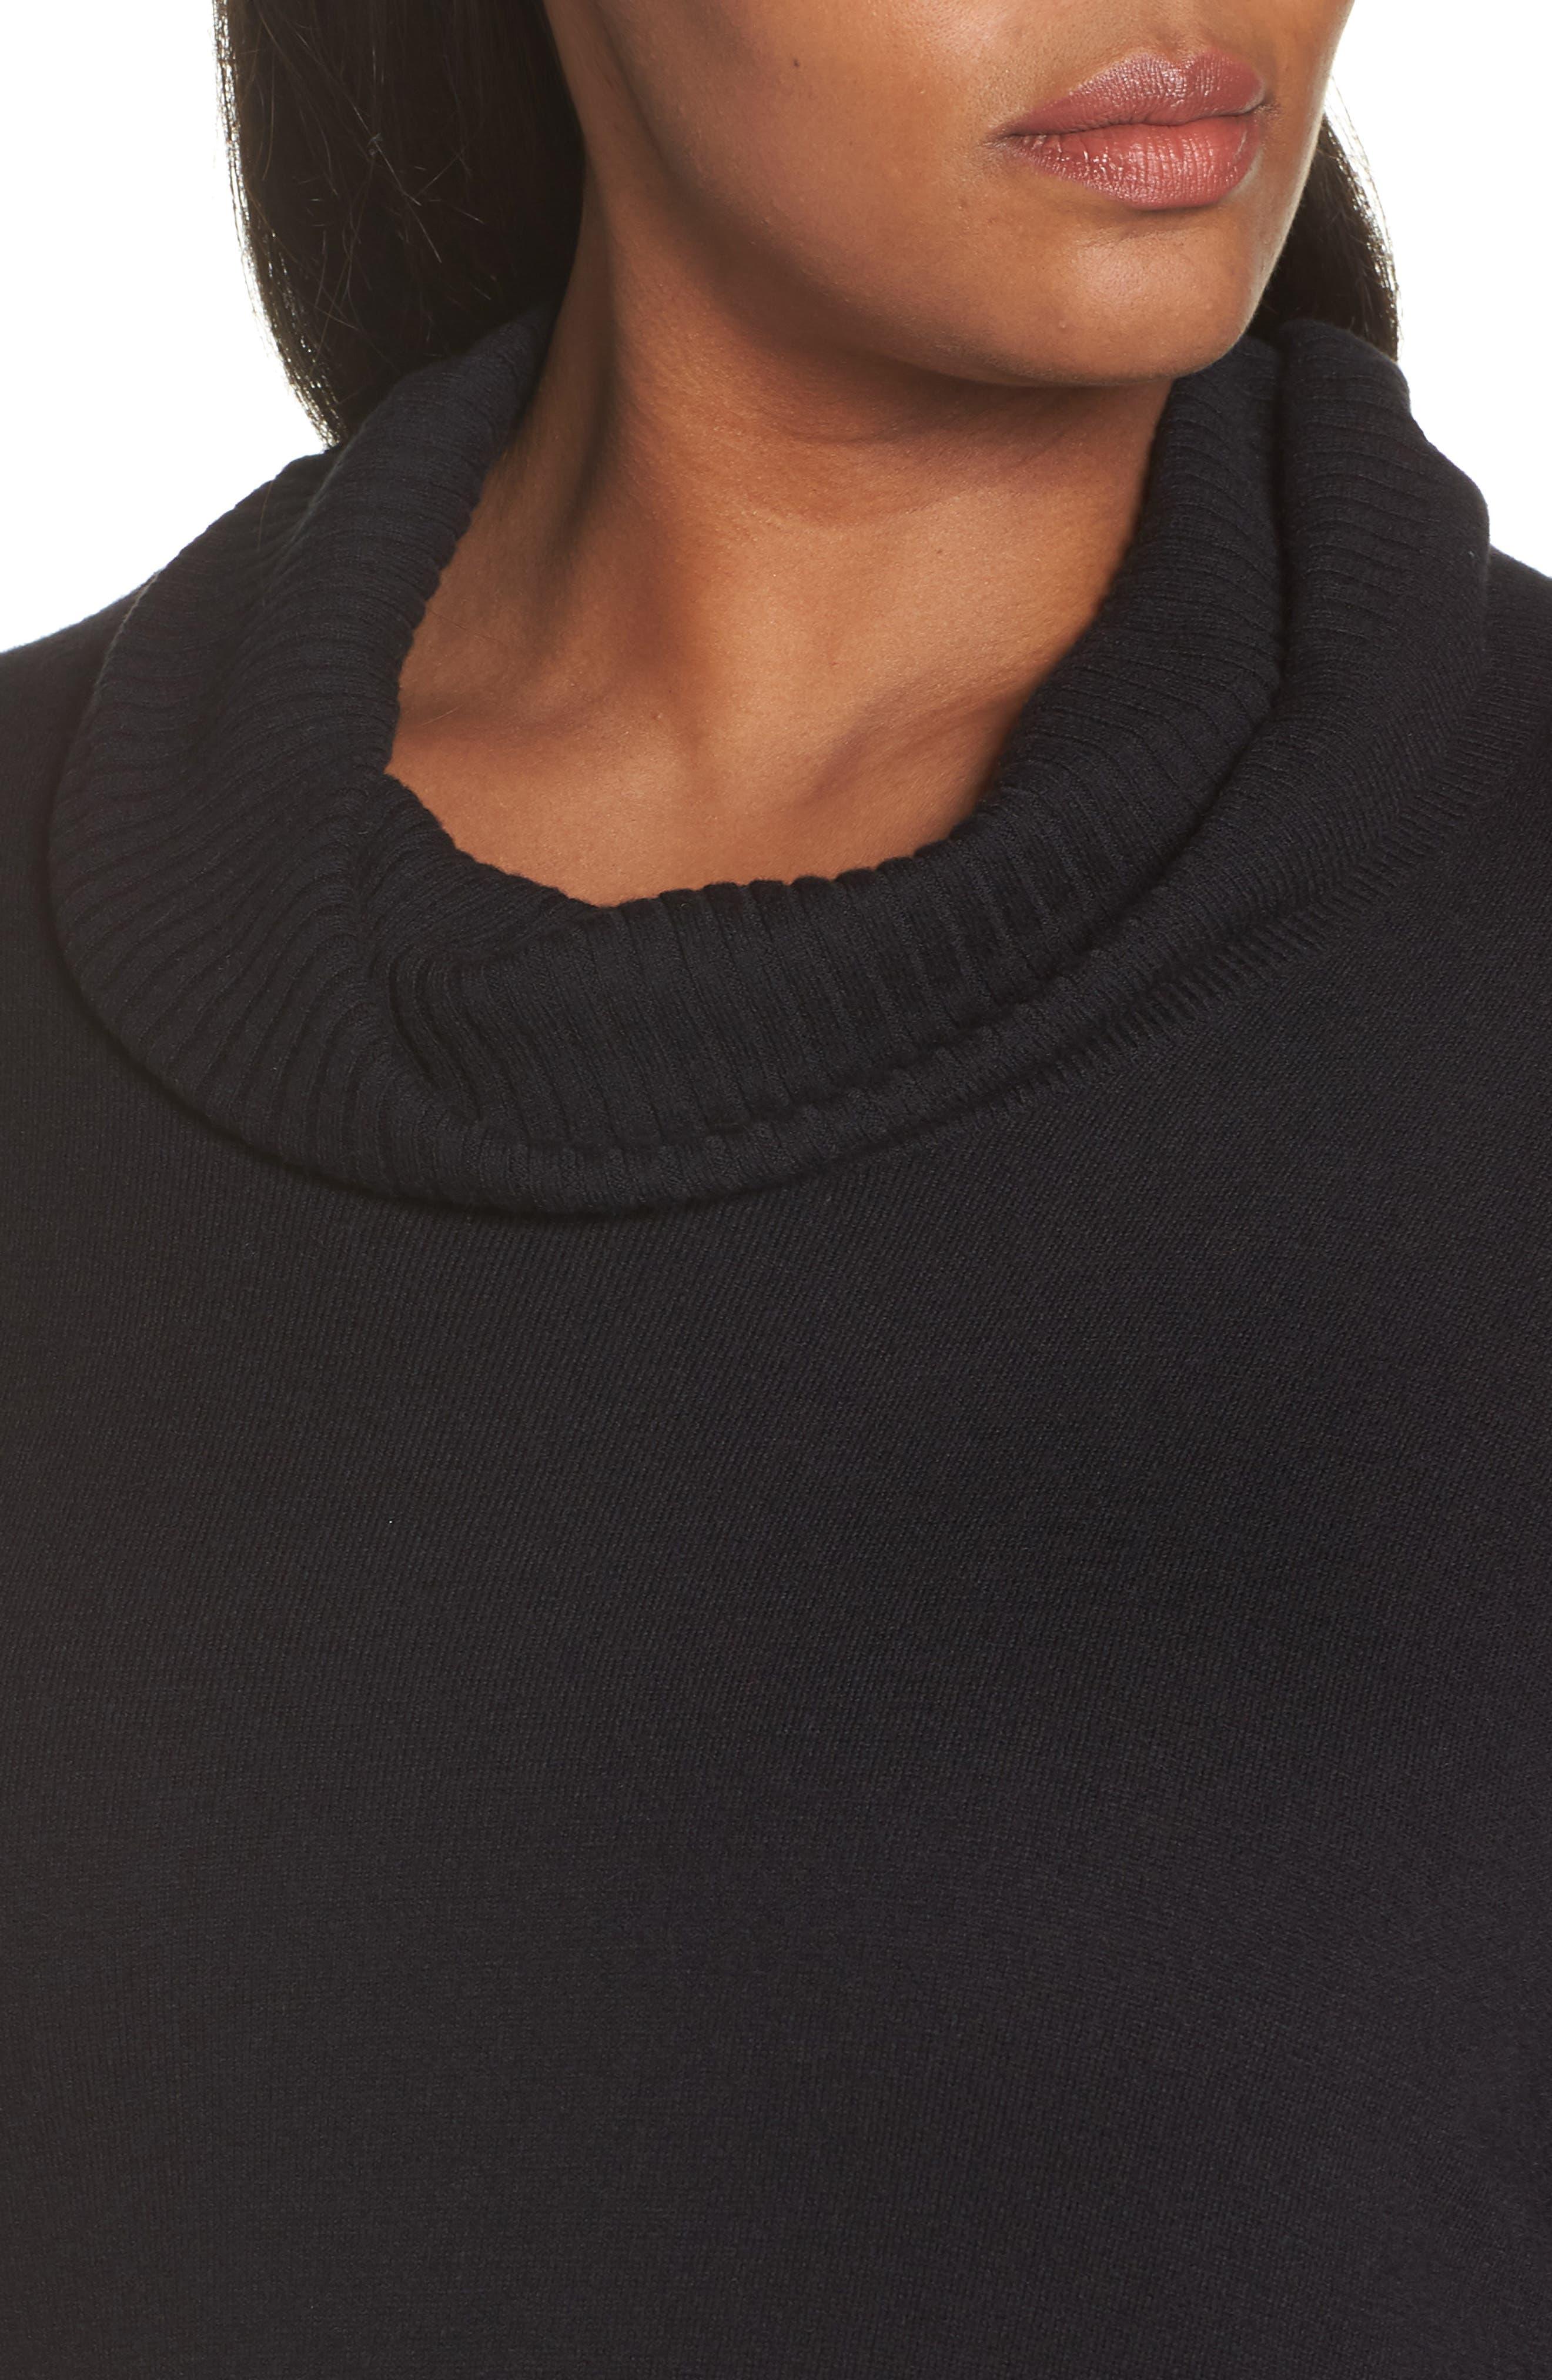 SEJOUR,                             Cowl Neck Pullover,                             Alternate thumbnail 4, color,                             BLACK